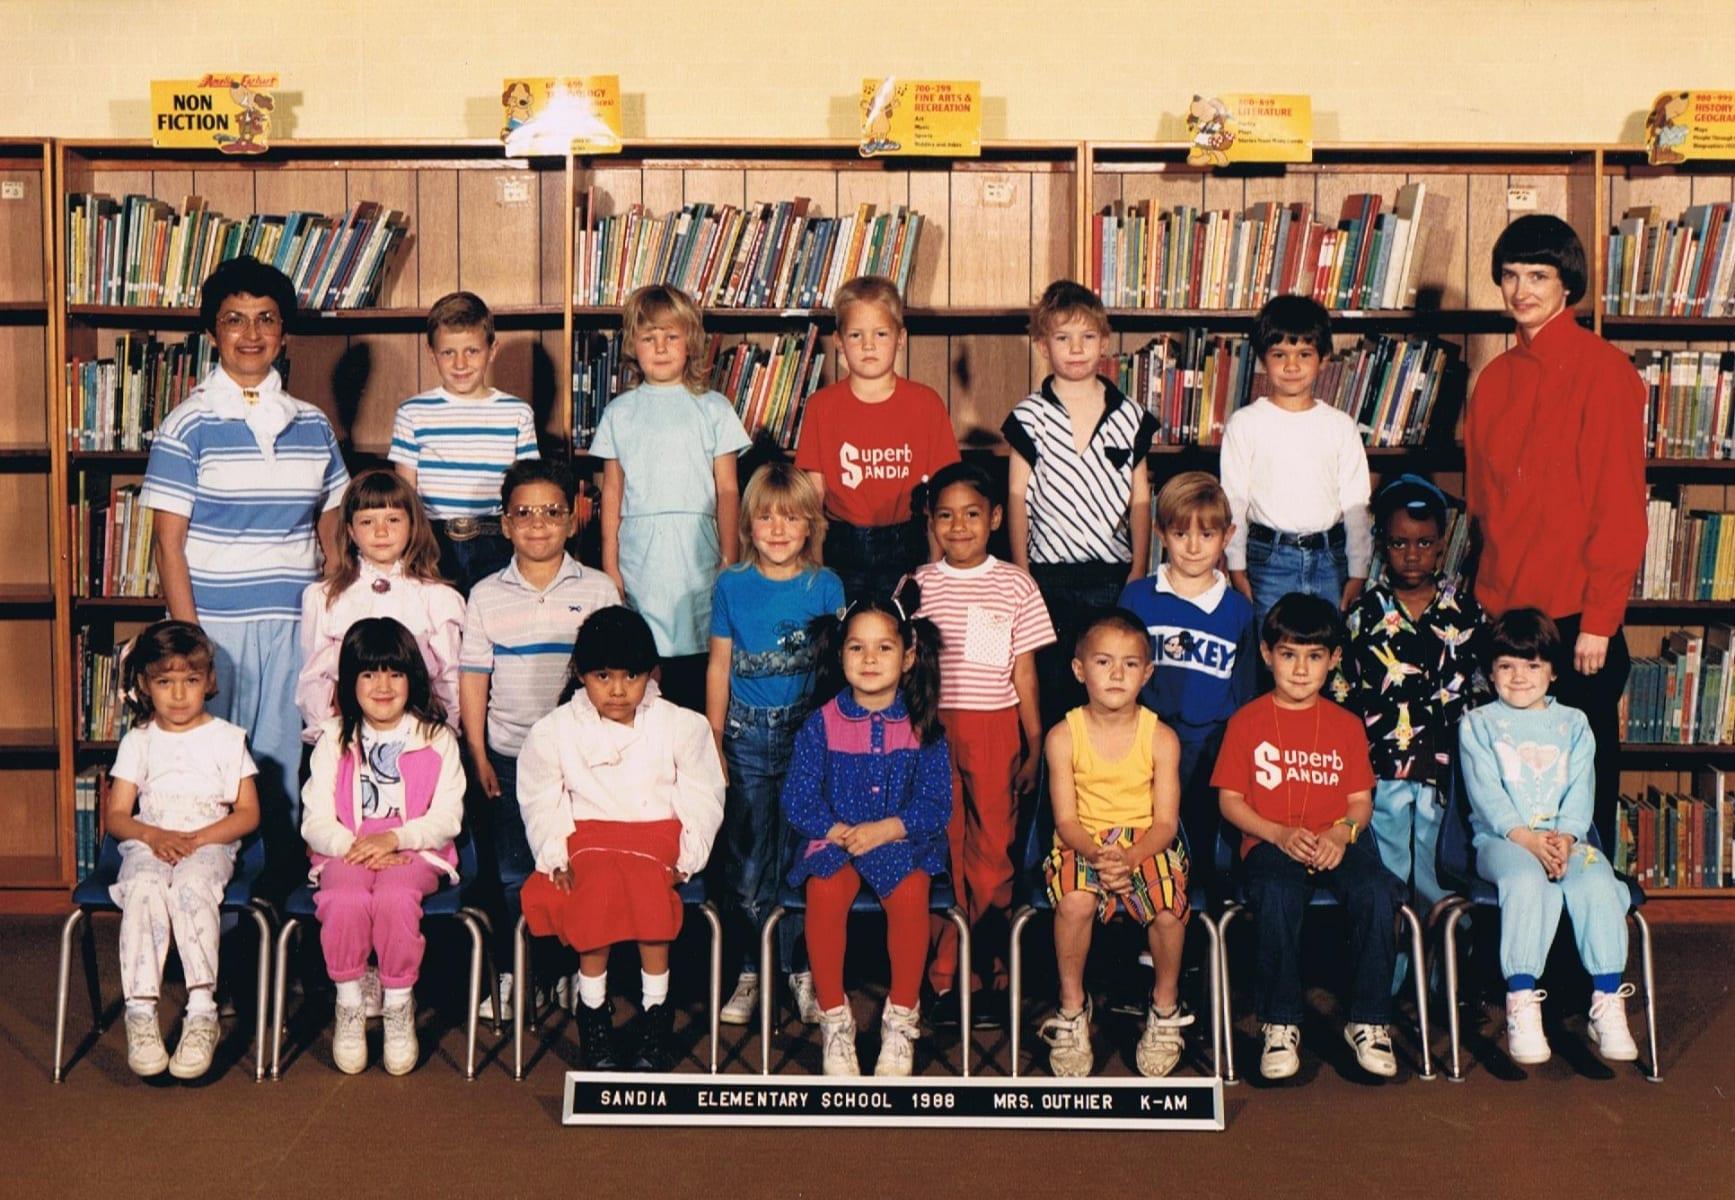 1988-jon-chris-sandia-in-clovis-school